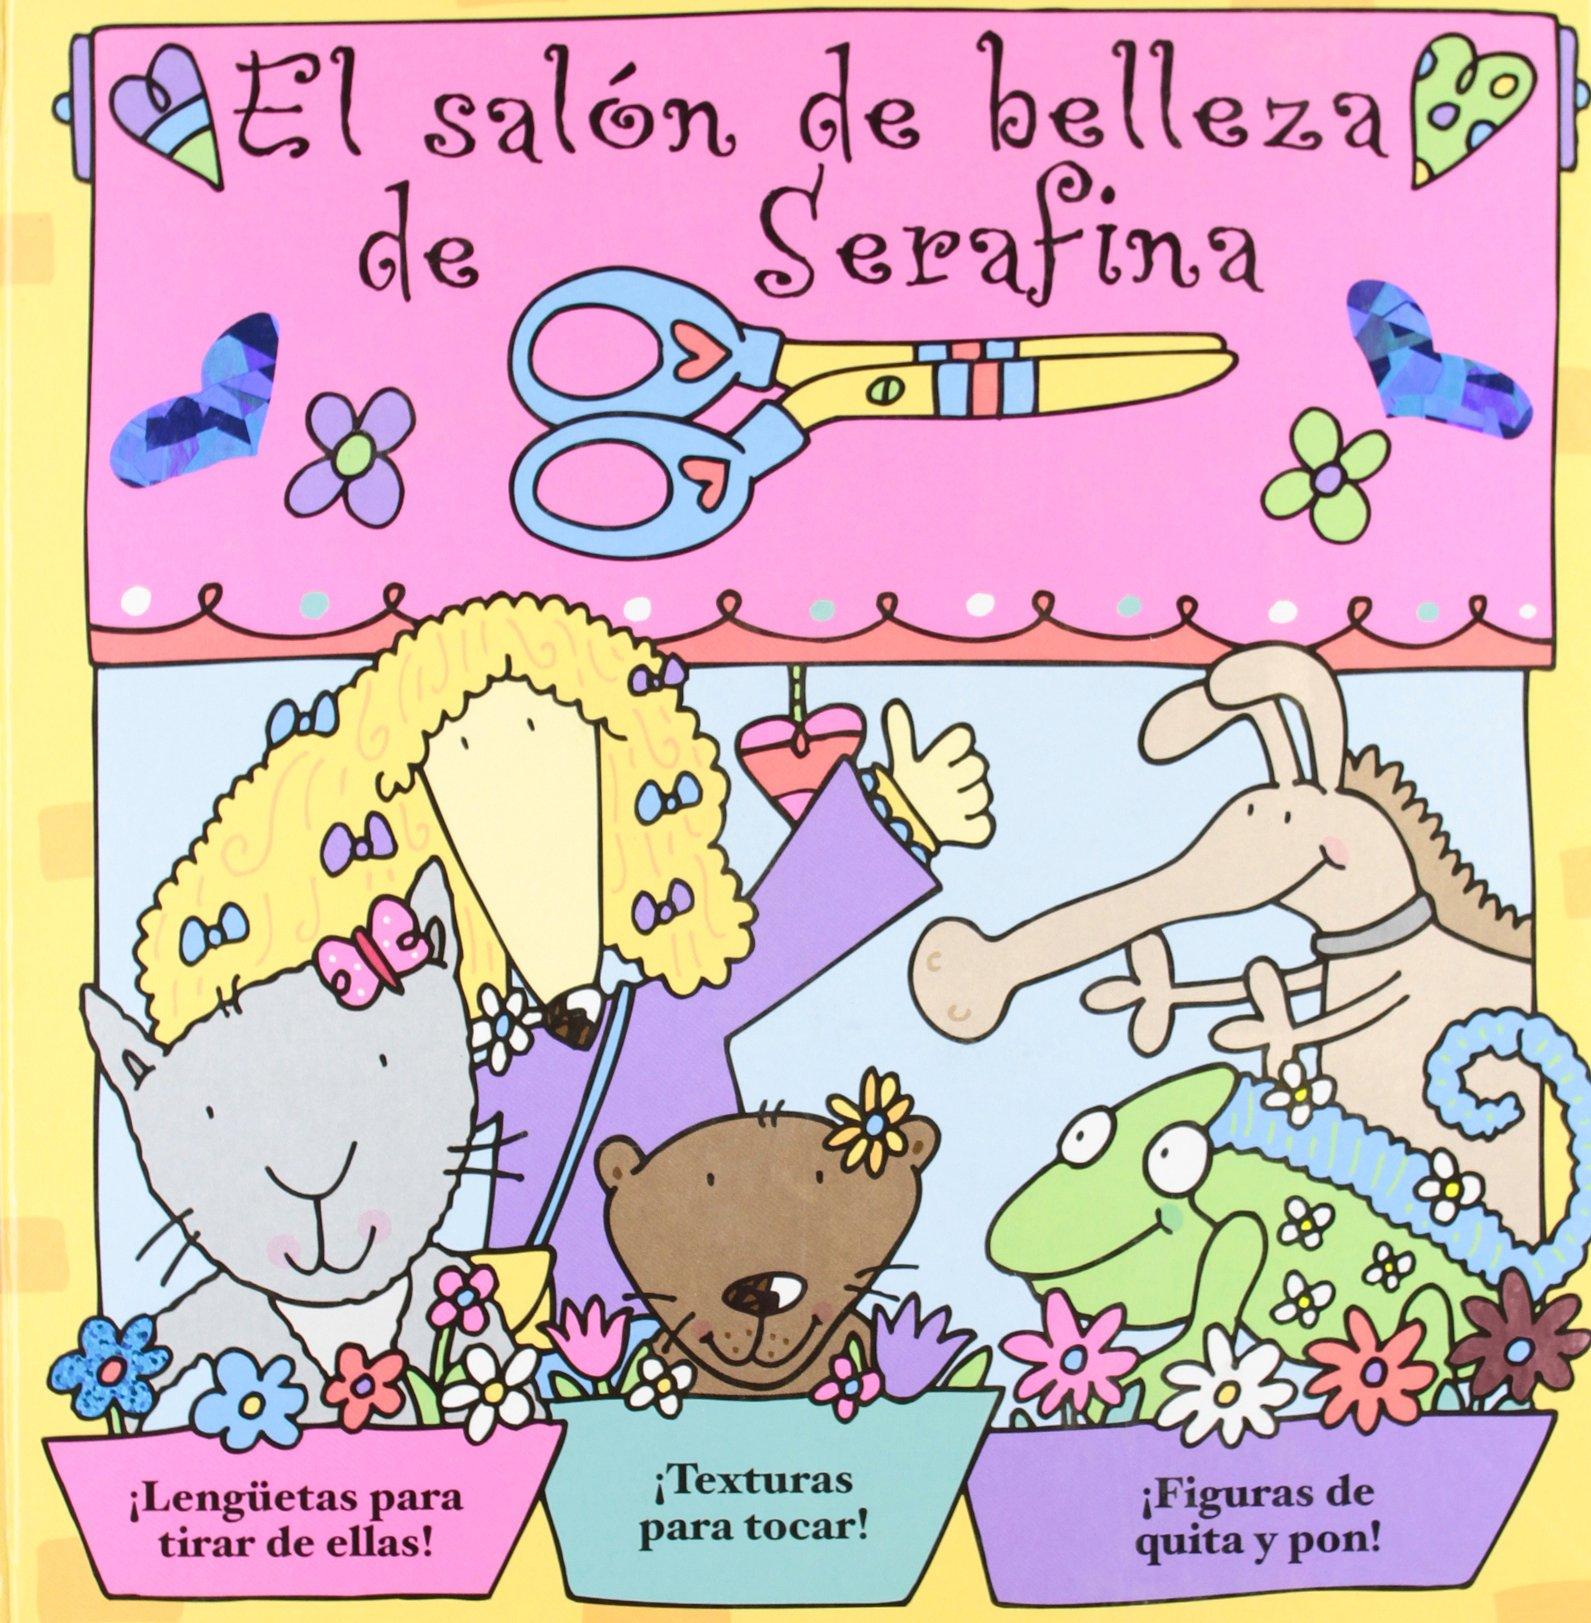 SALON DE BELLEZA DE SERAFINA, EL (Spanish Edition) (Spanish) Hardcover – 2014